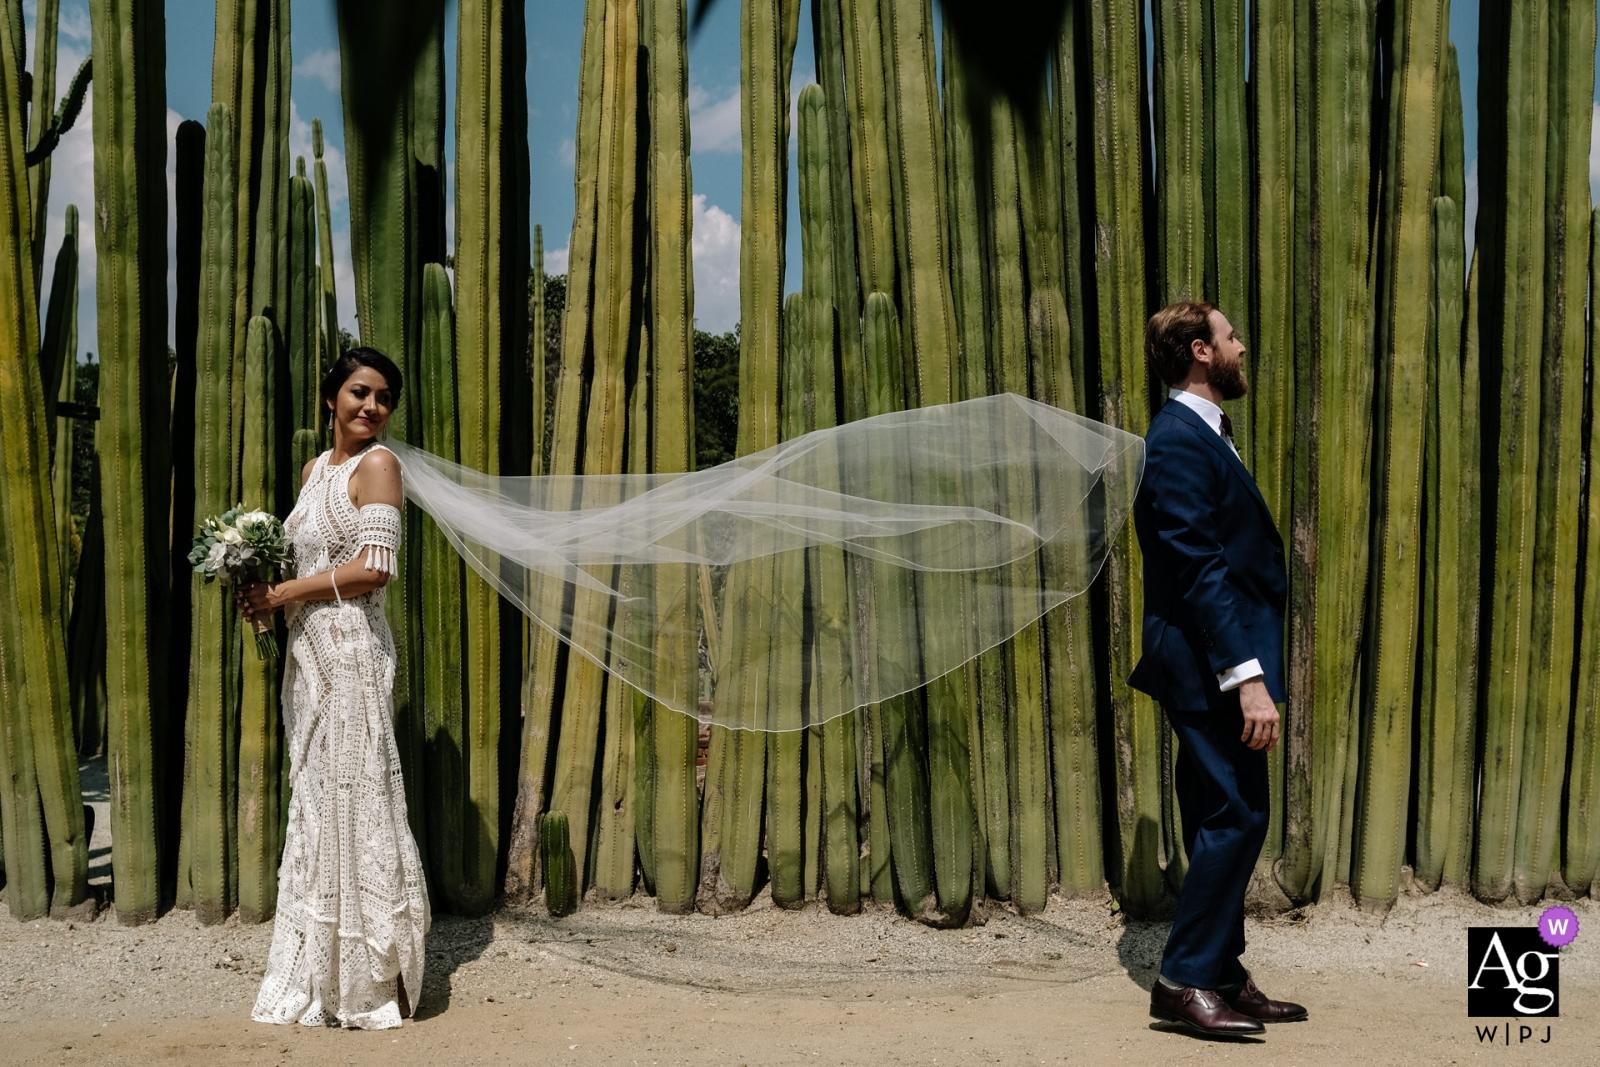 Jardin Etnobotanico de Oaxaca - Wedding Photography, Newlywed portrait